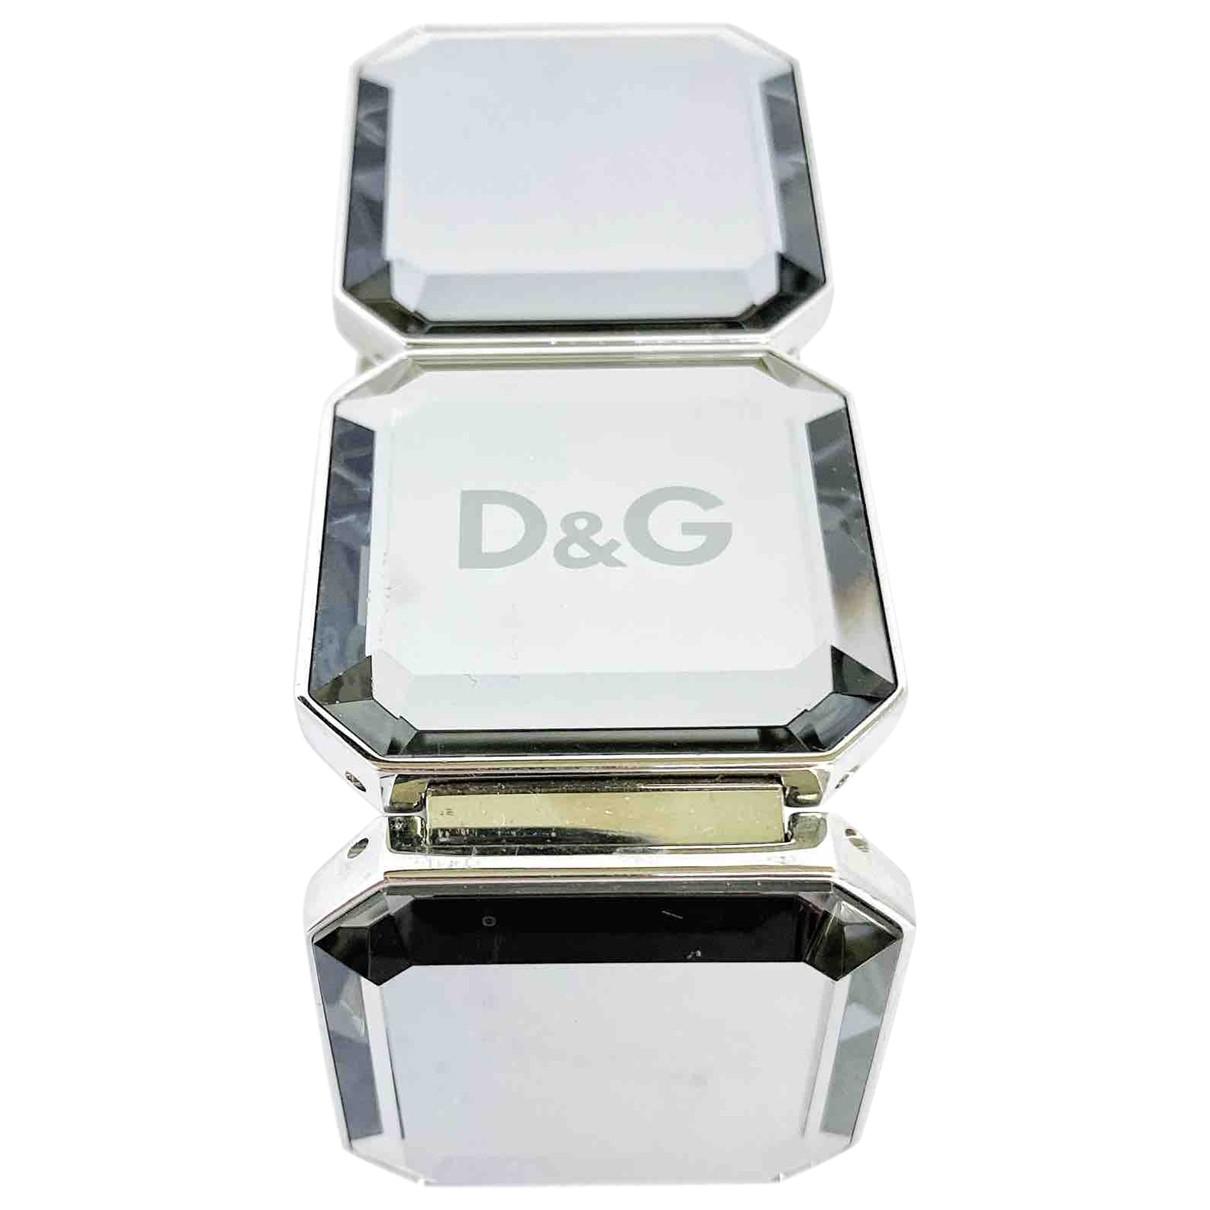 D&g - Bracelet   pour femme en metal - metallise